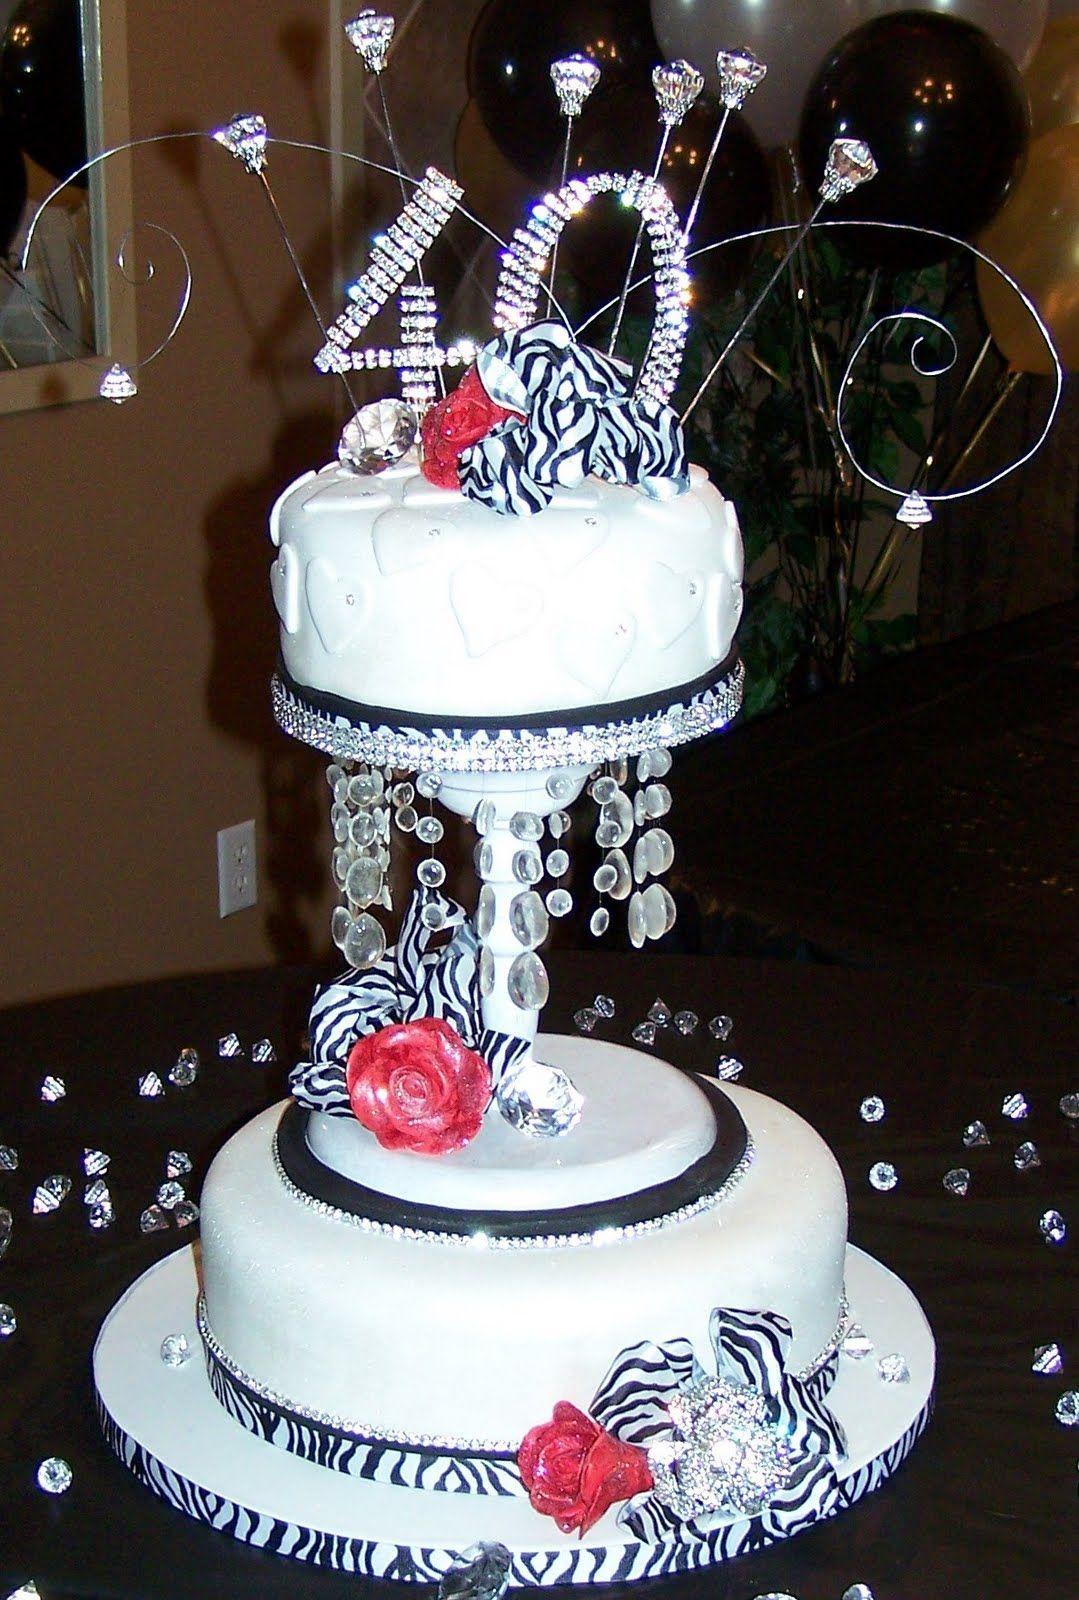 Bling Birthday Cake Designs